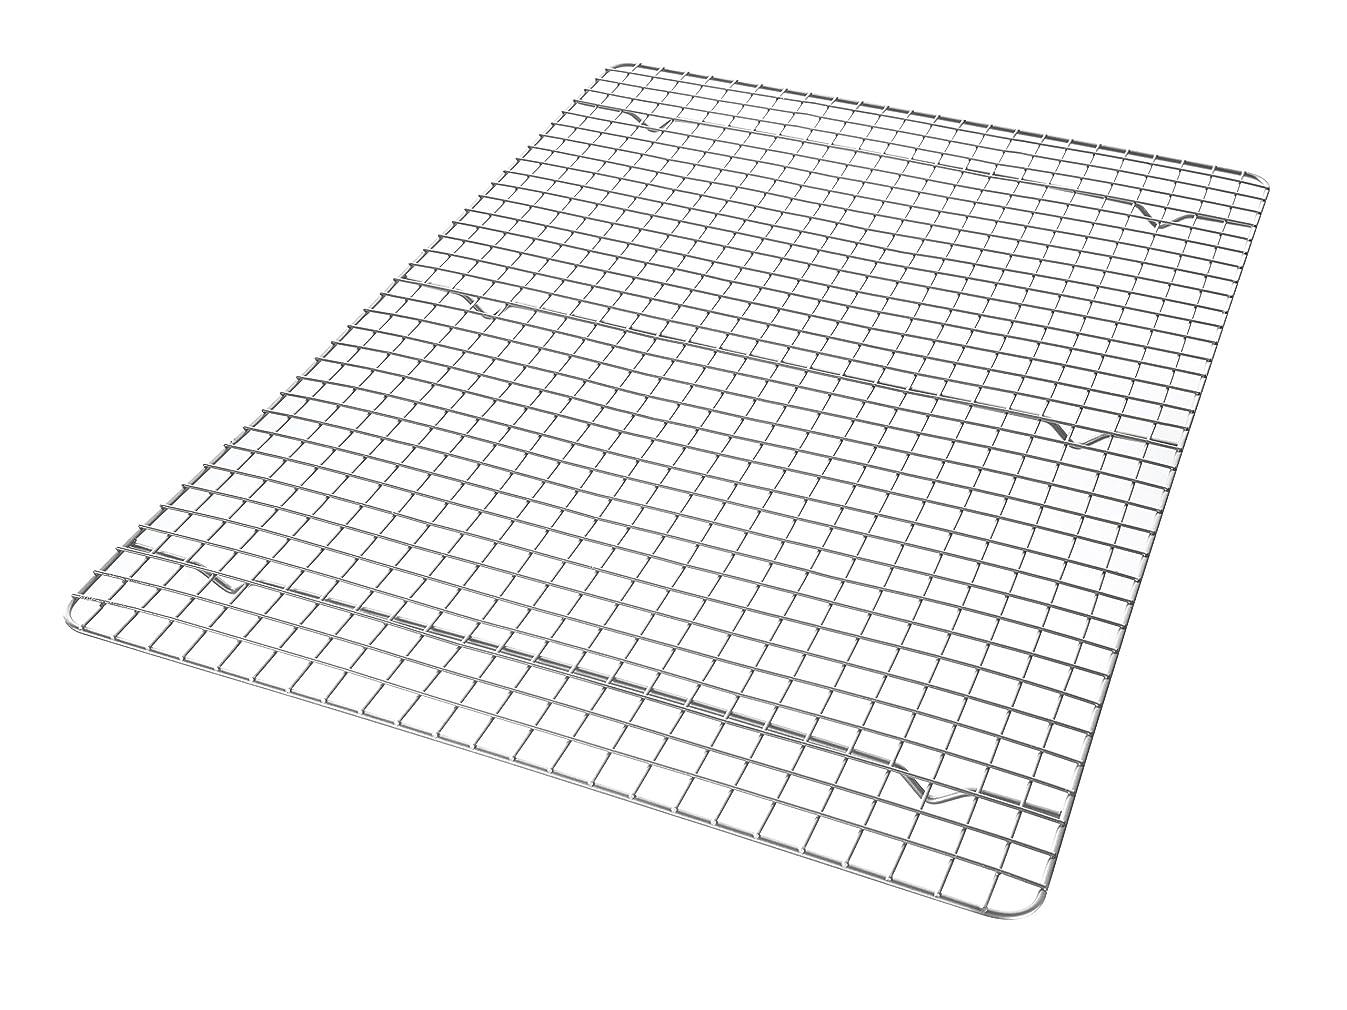 USA Pan 1603CR X-Large Bakeable Nonstick Cooling Rack, XL Sheet, Metal